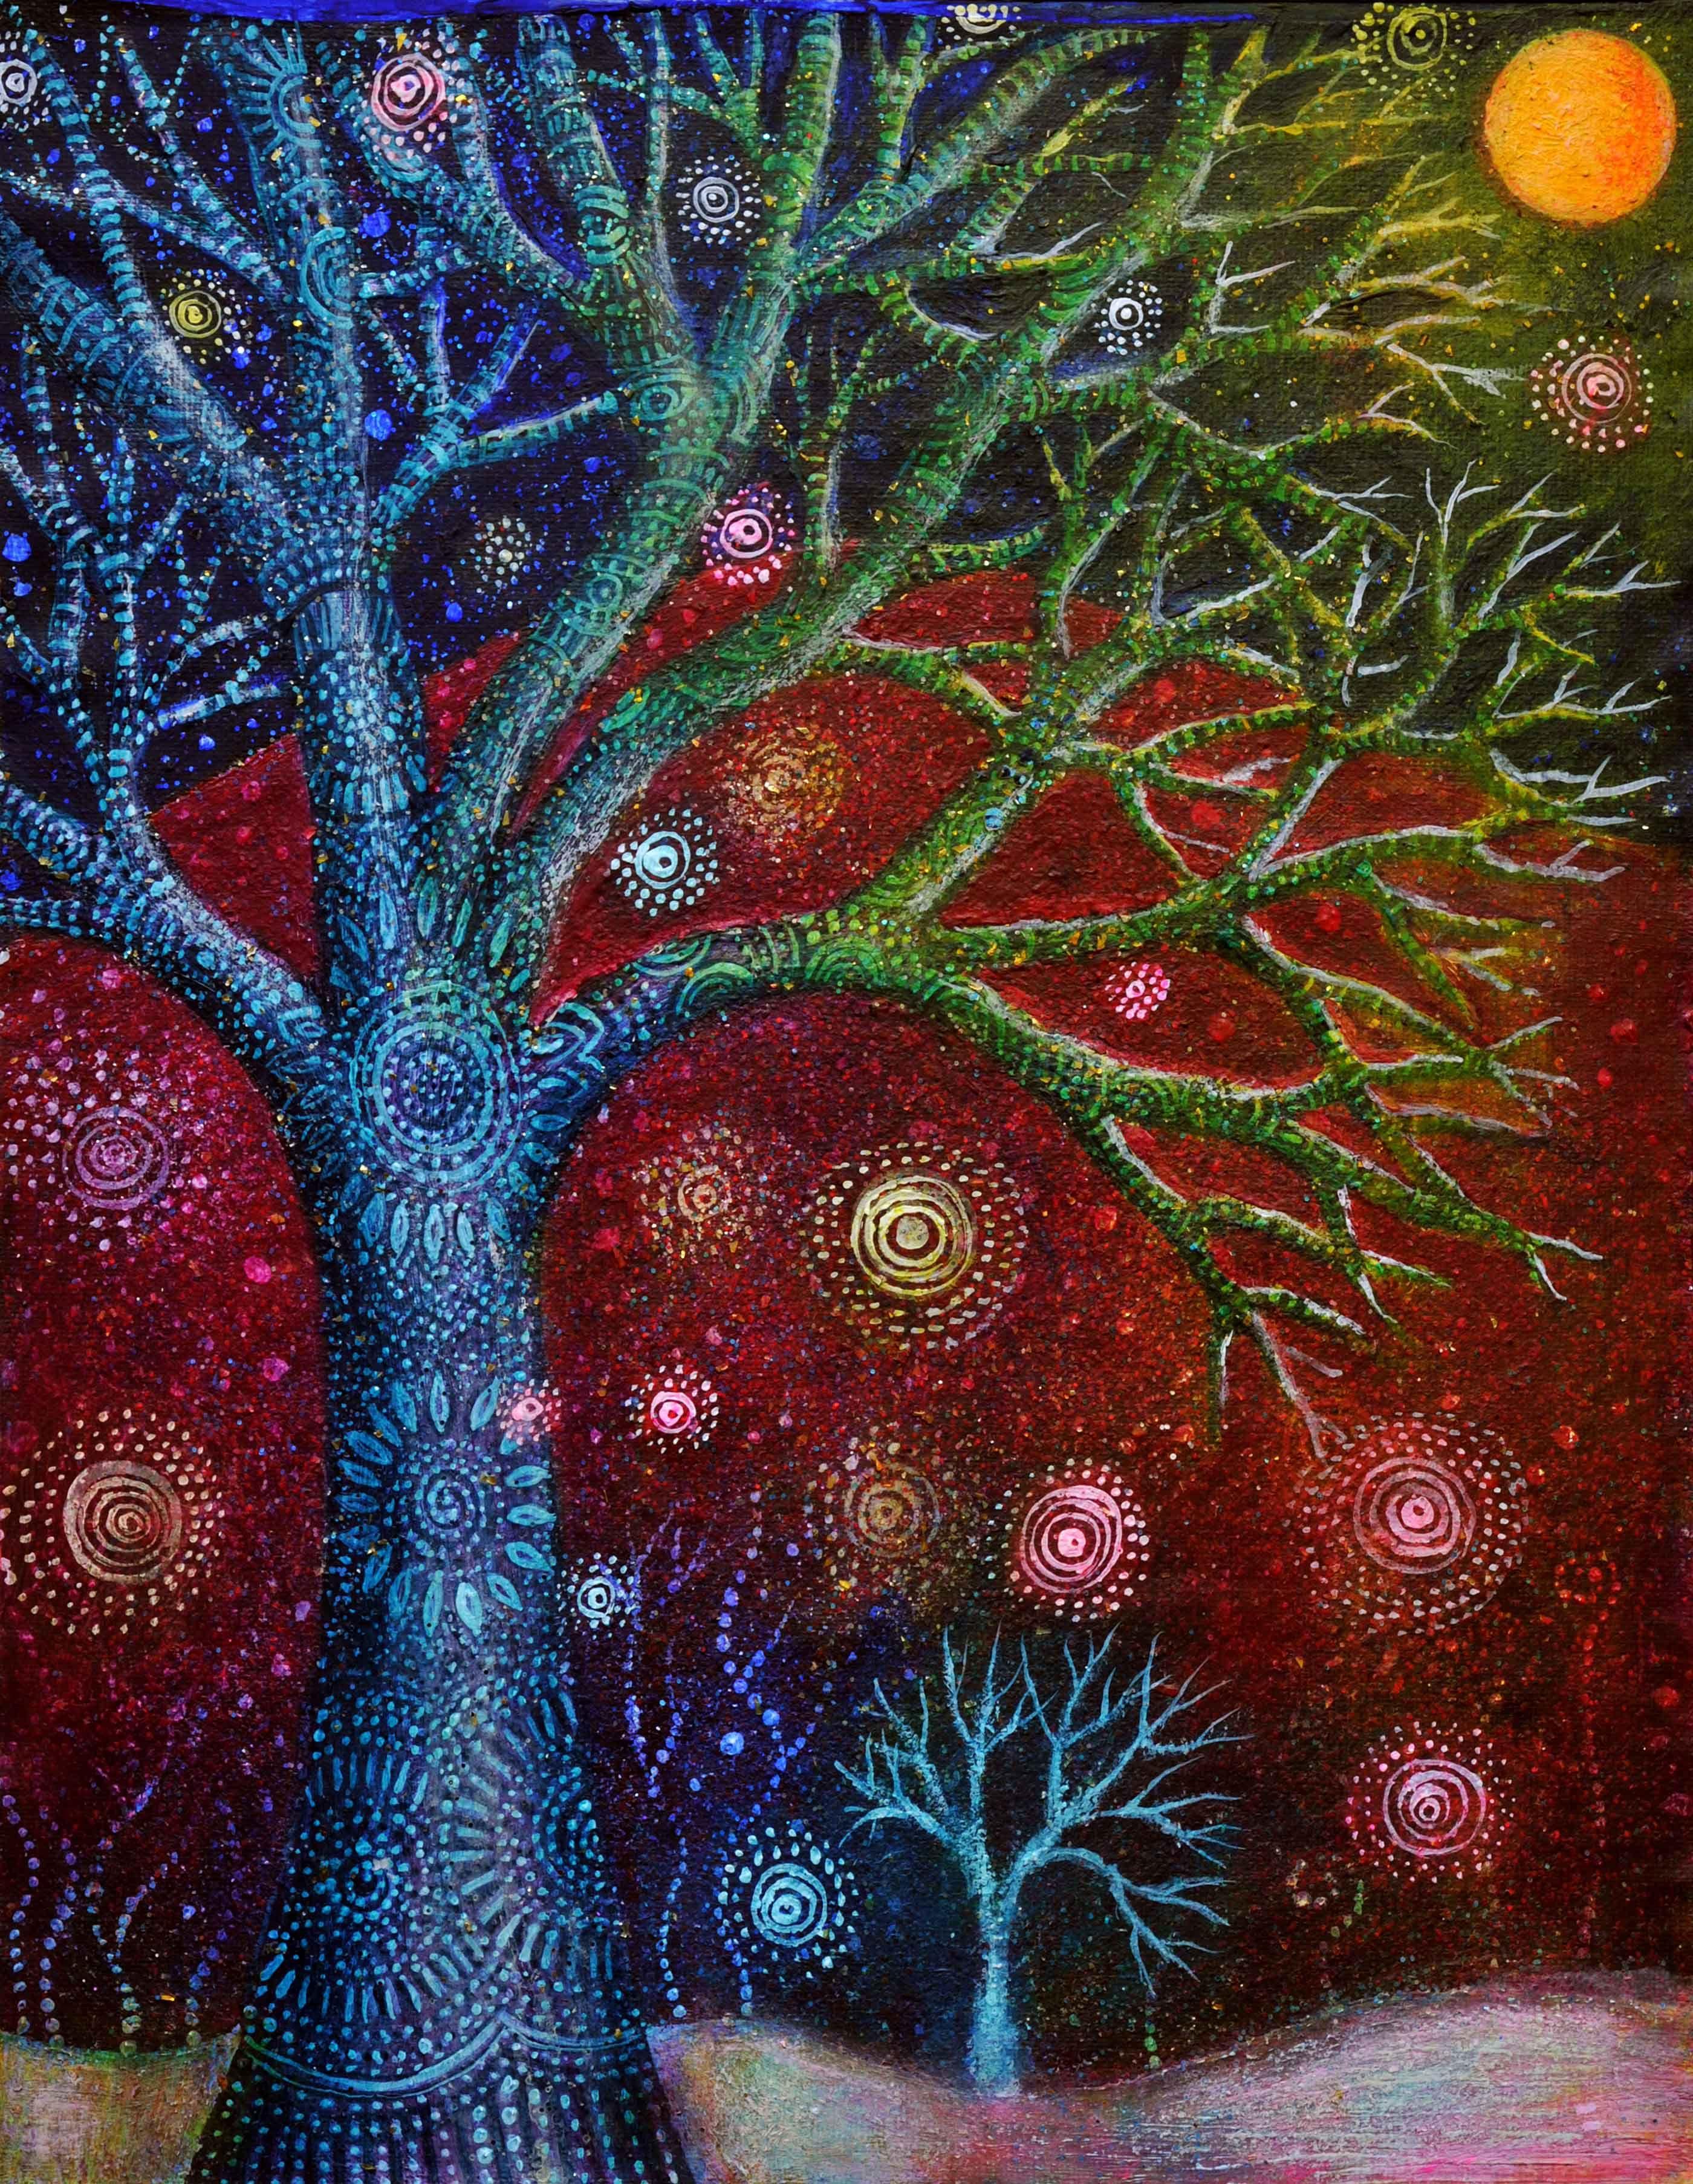 winter solstice tree dot painting pinterest baum spiralen und spiritualit t. Black Bedroom Furniture Sets. Home Design Ideas